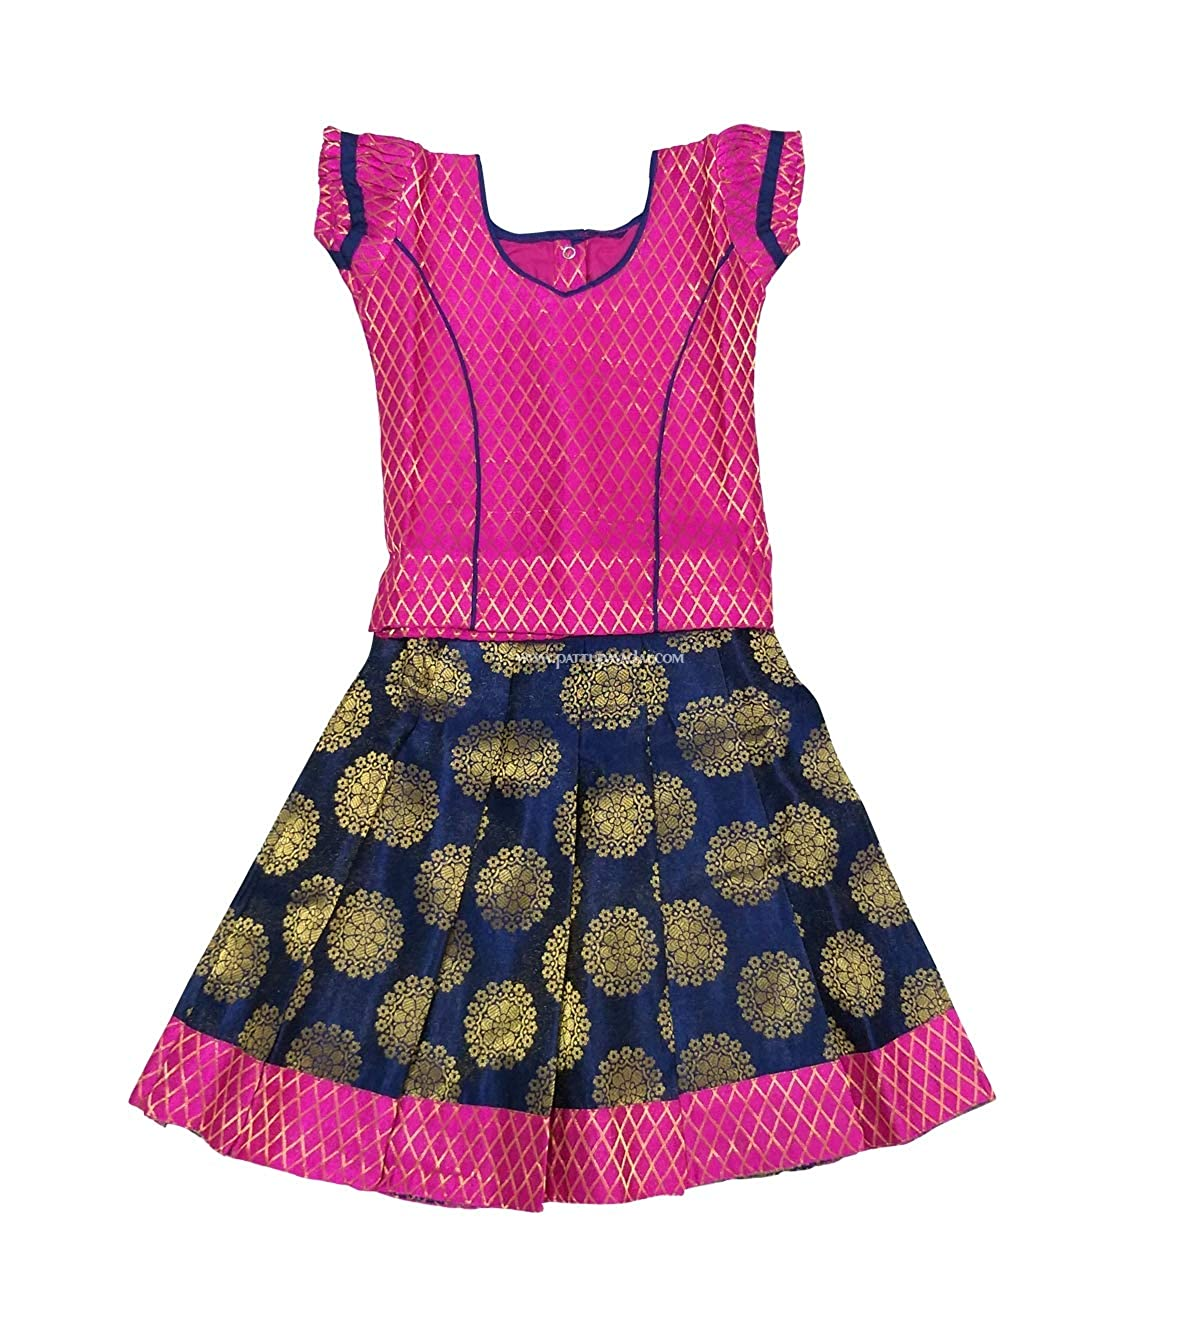 d1c4d2c433f5 Pattu Pavadai Banarasi Pavadai Sattai Navy Blue and Pink for Baby Girls and  Kids – 6 Months: Amazon.in: Clothing & Accessories